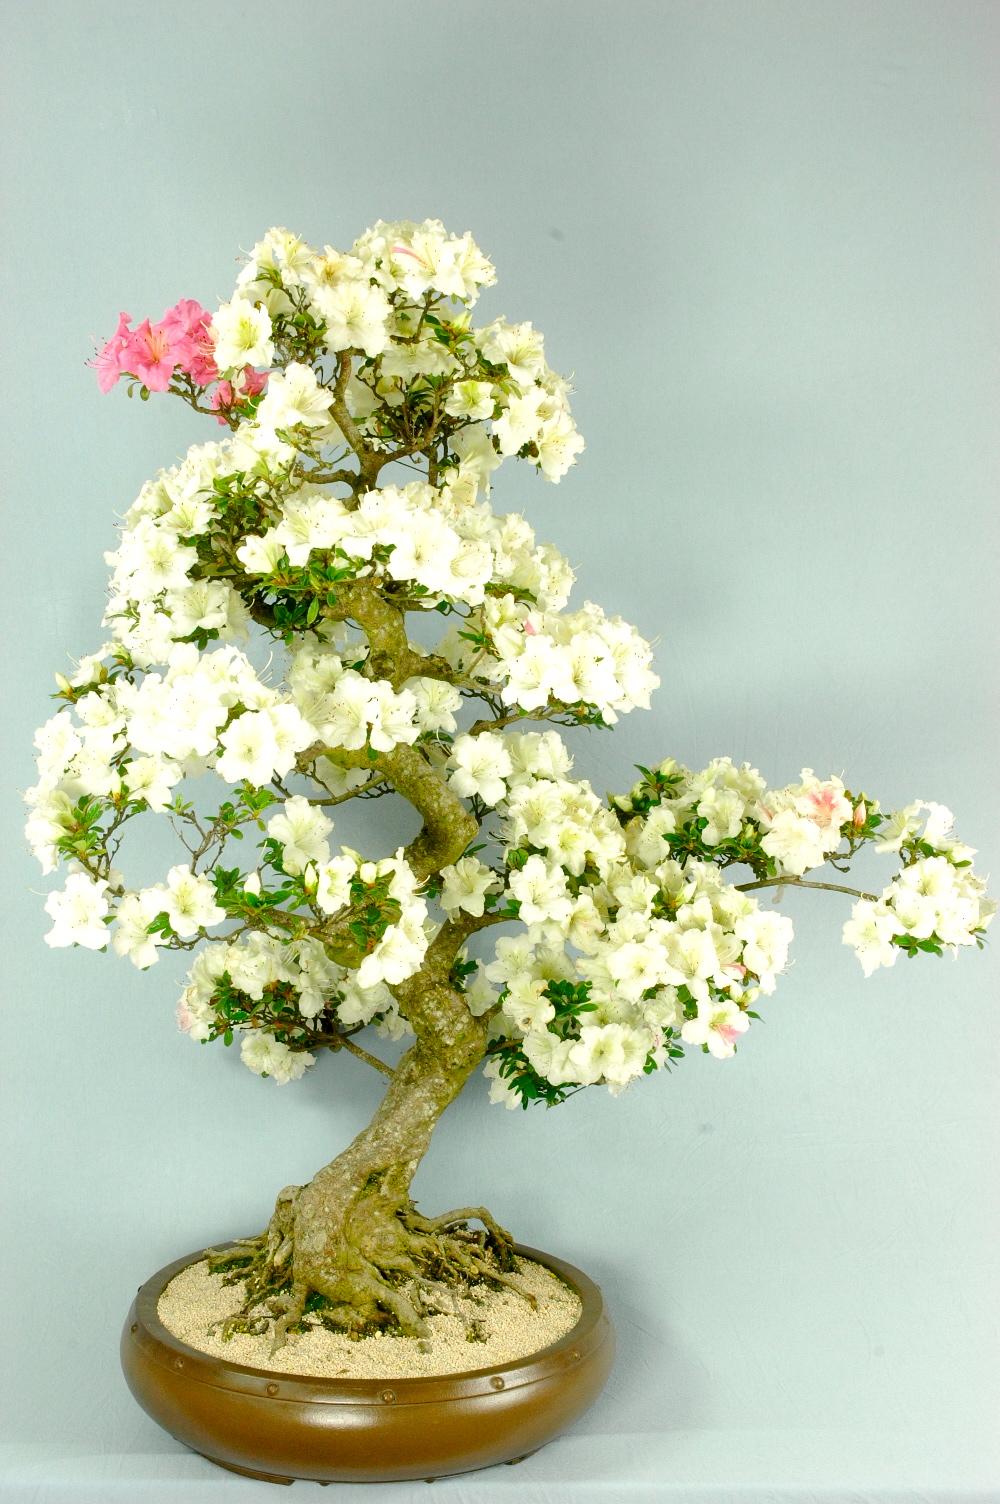 Specimen Japanese Satsuki Azalea Bonsai 60 Years Bonsai Trees For Sale Uk